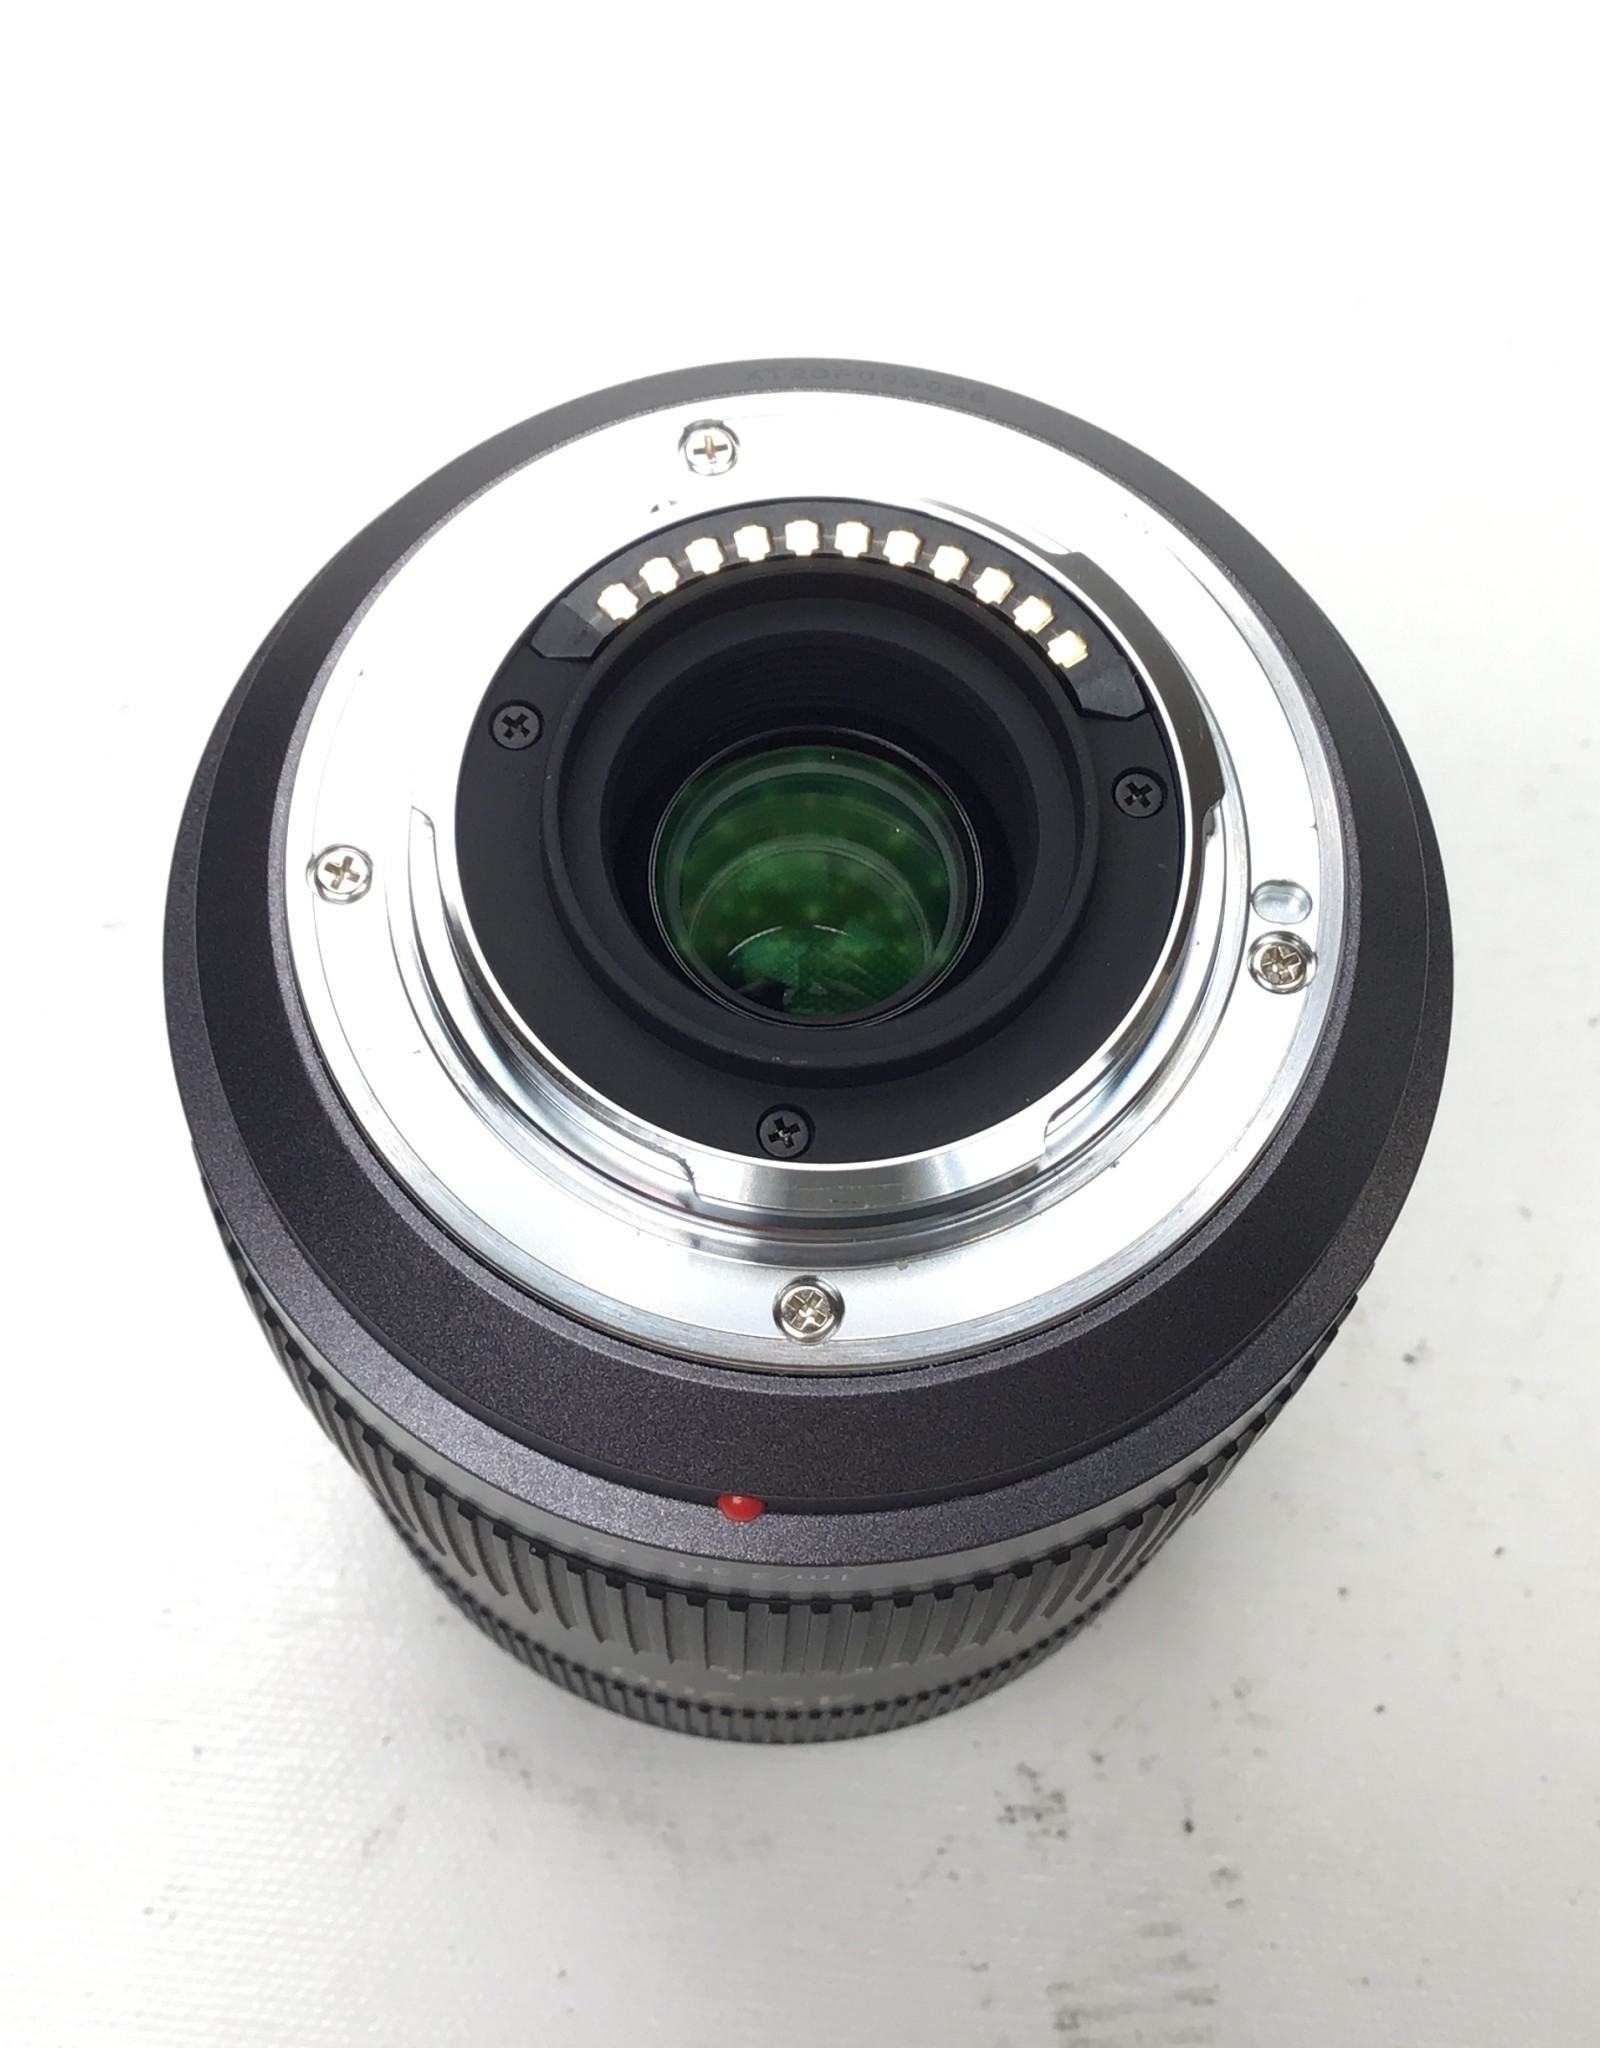 PANASONIC Panasonic Lumix G Vario 45-200mm f4.5.6 Lens Used EX